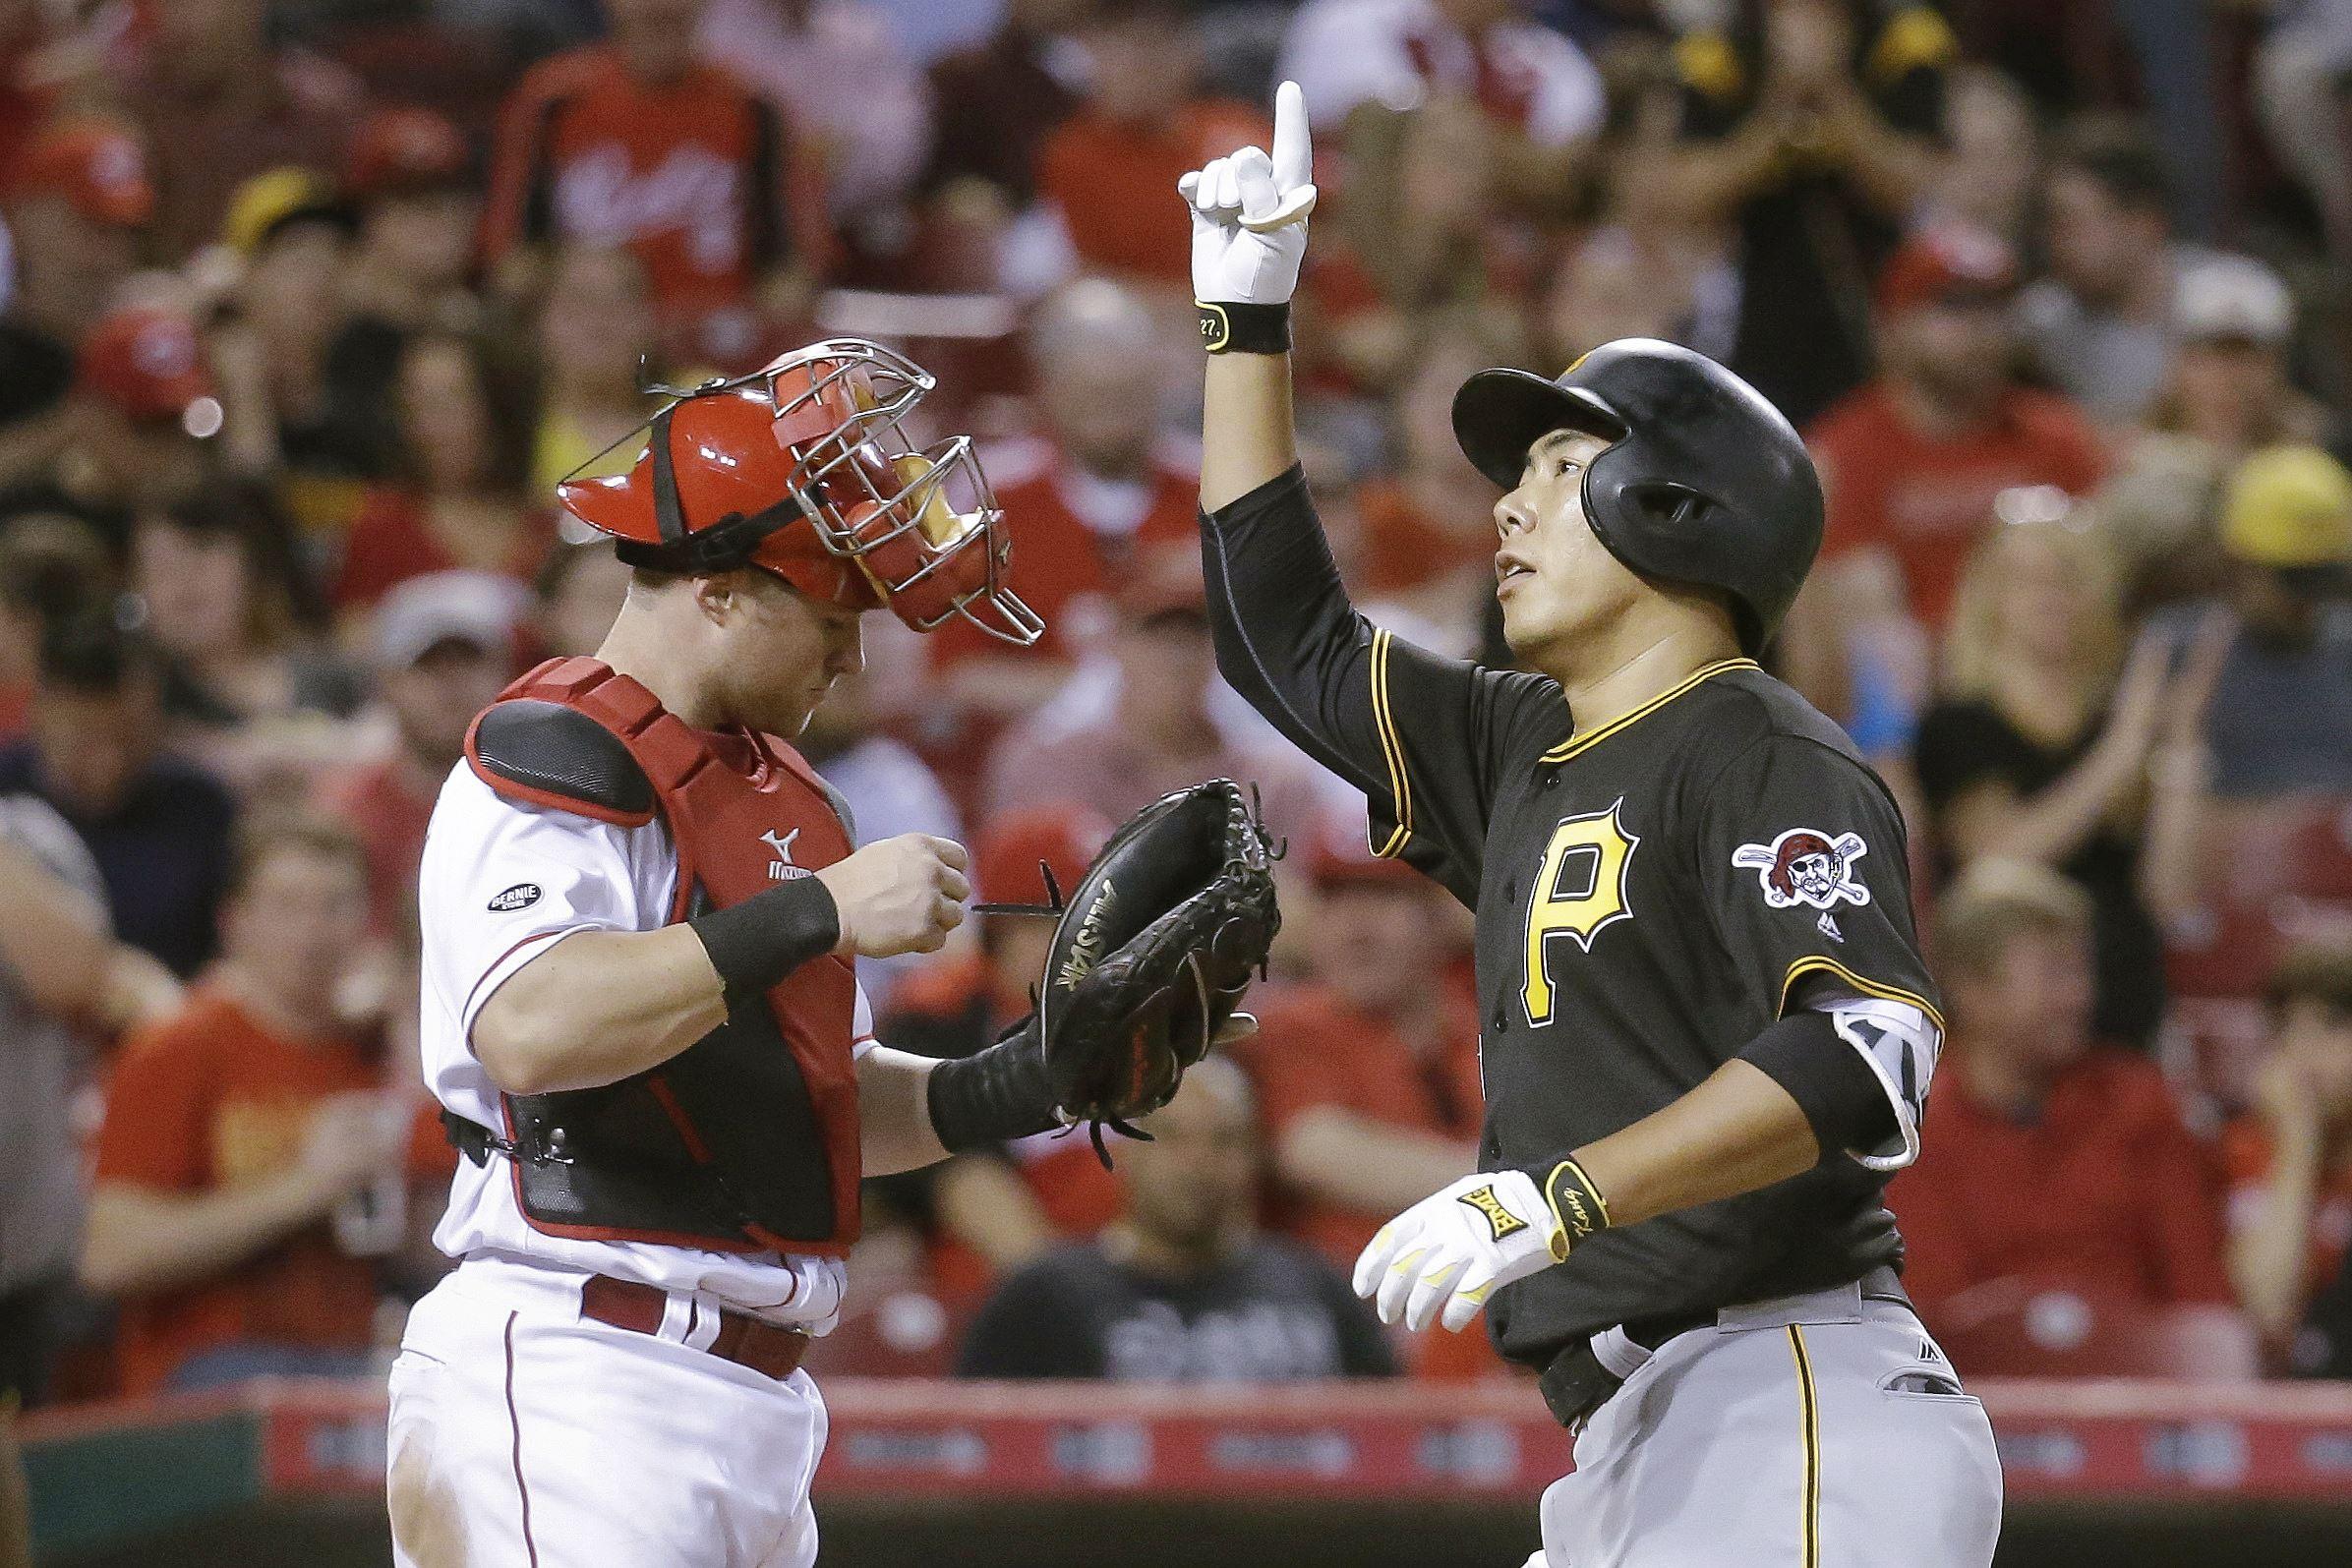 Pirates beat Reds, 5-4, to split rain-shortened series